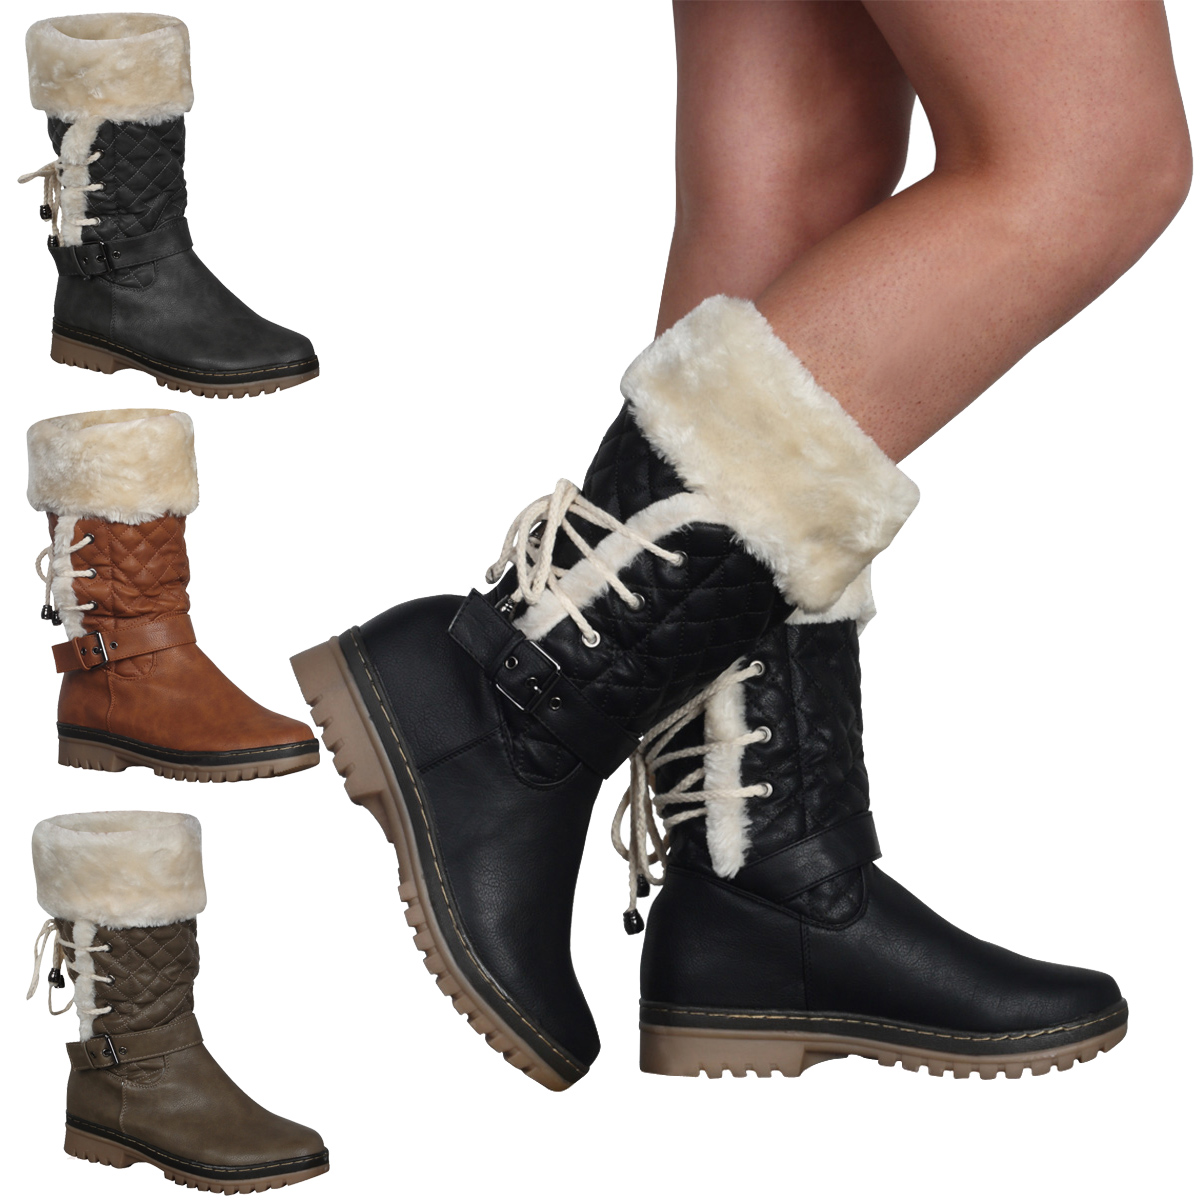 new faux fur trim womens grip sole warm winter calf